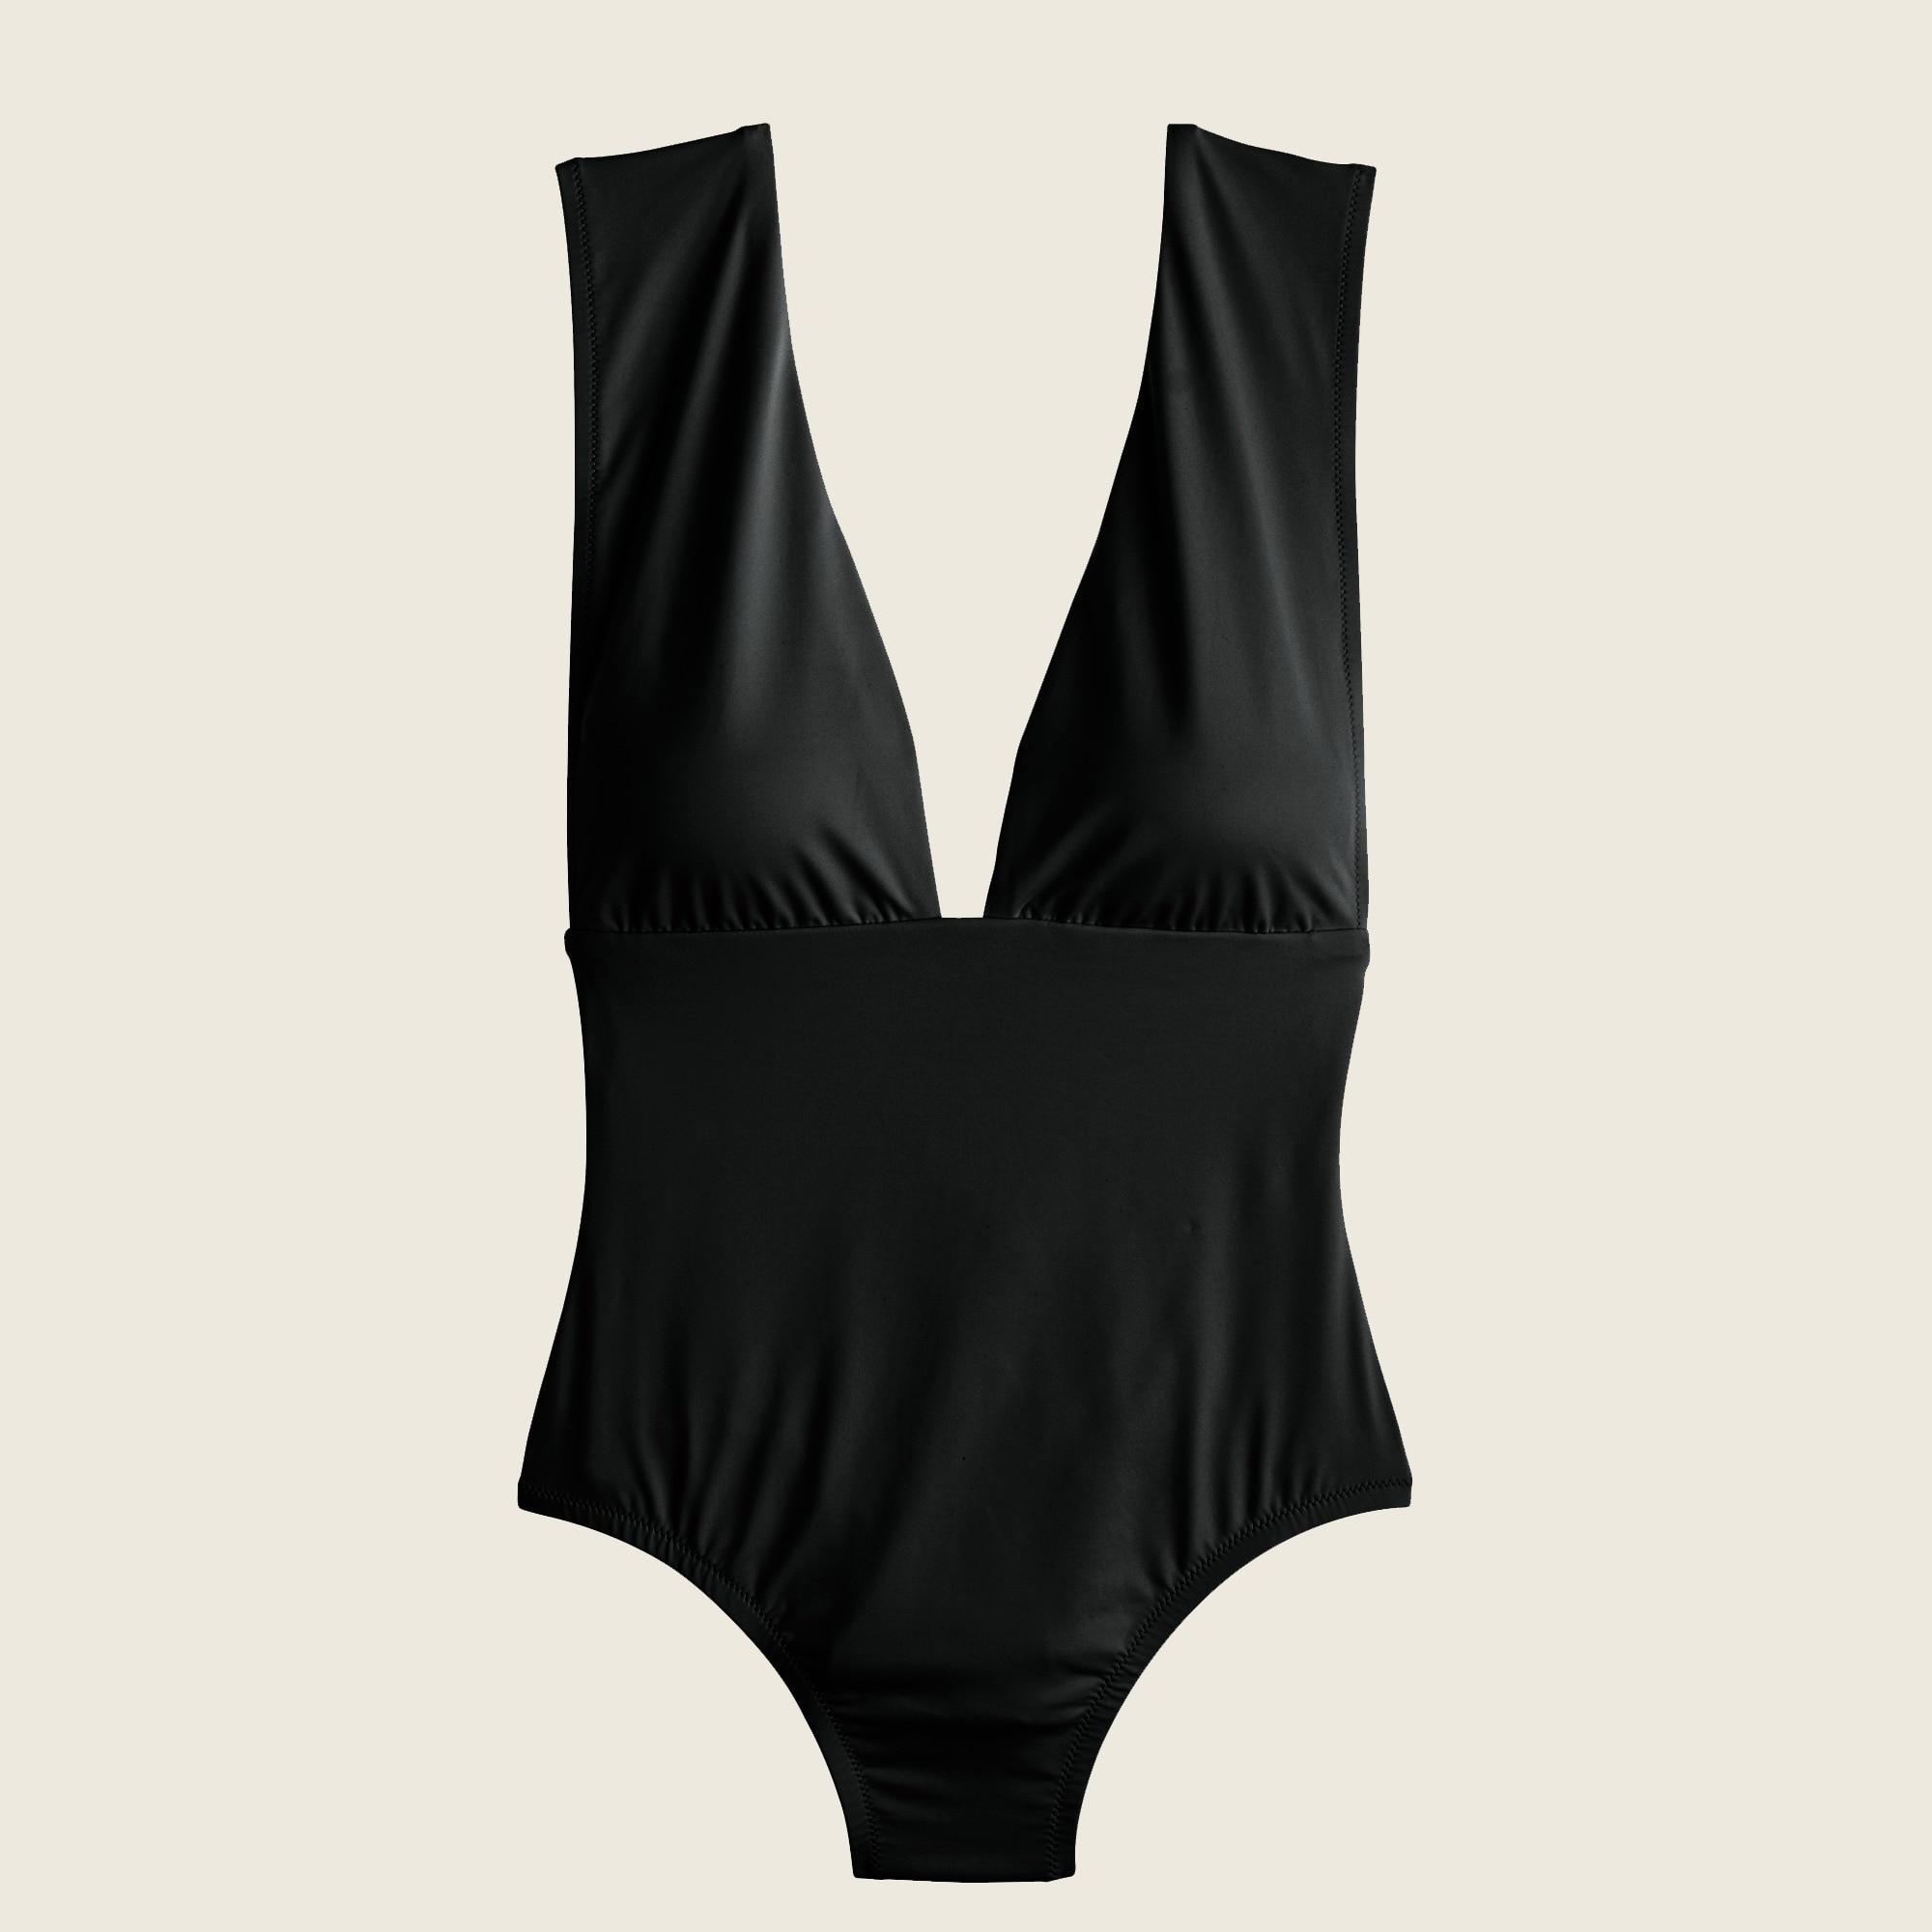 Plunge V-neck one-piece swimsuit